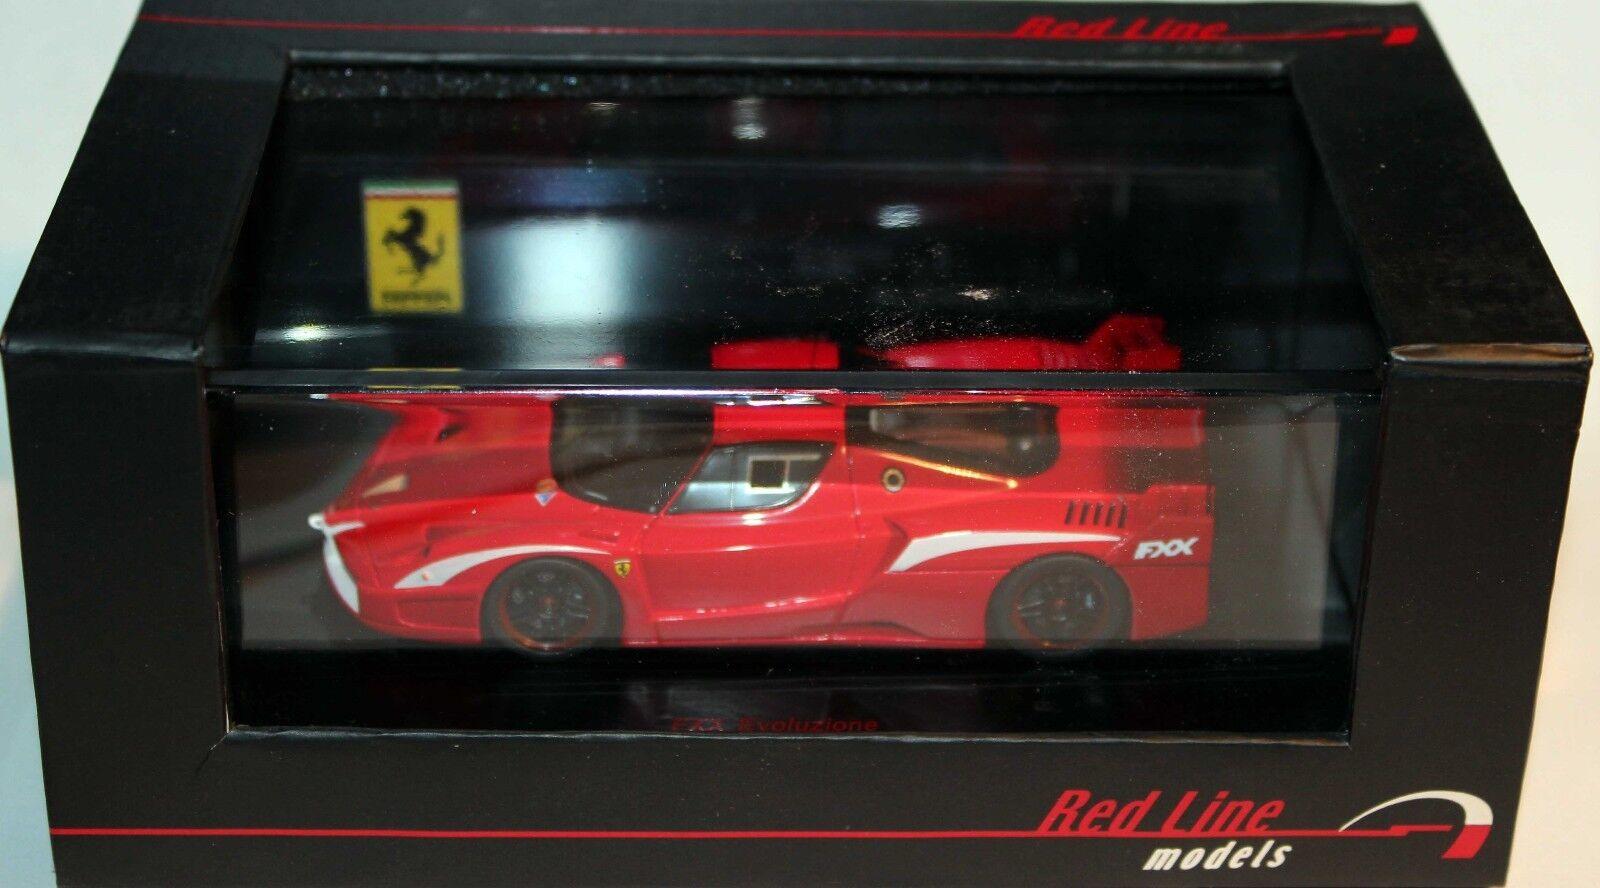 mejor servicio rojoline Modelos Modelos Modelos 1 43 Ferrari Fxx Evoluzione RL128  punto de venta